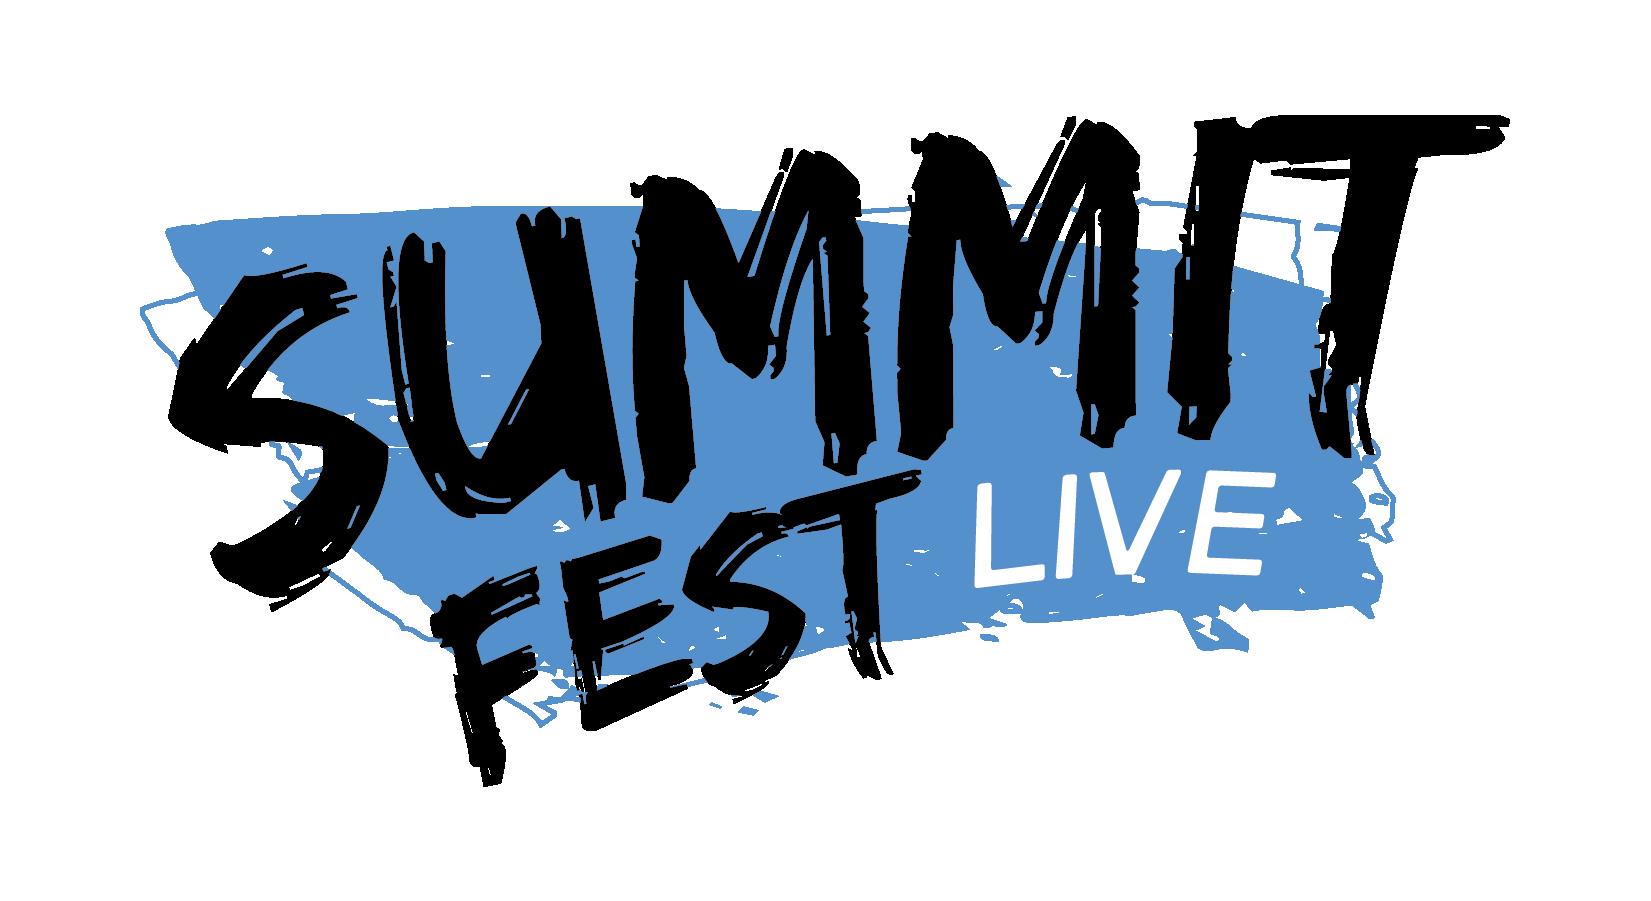 summitfestlive-logo-final-01